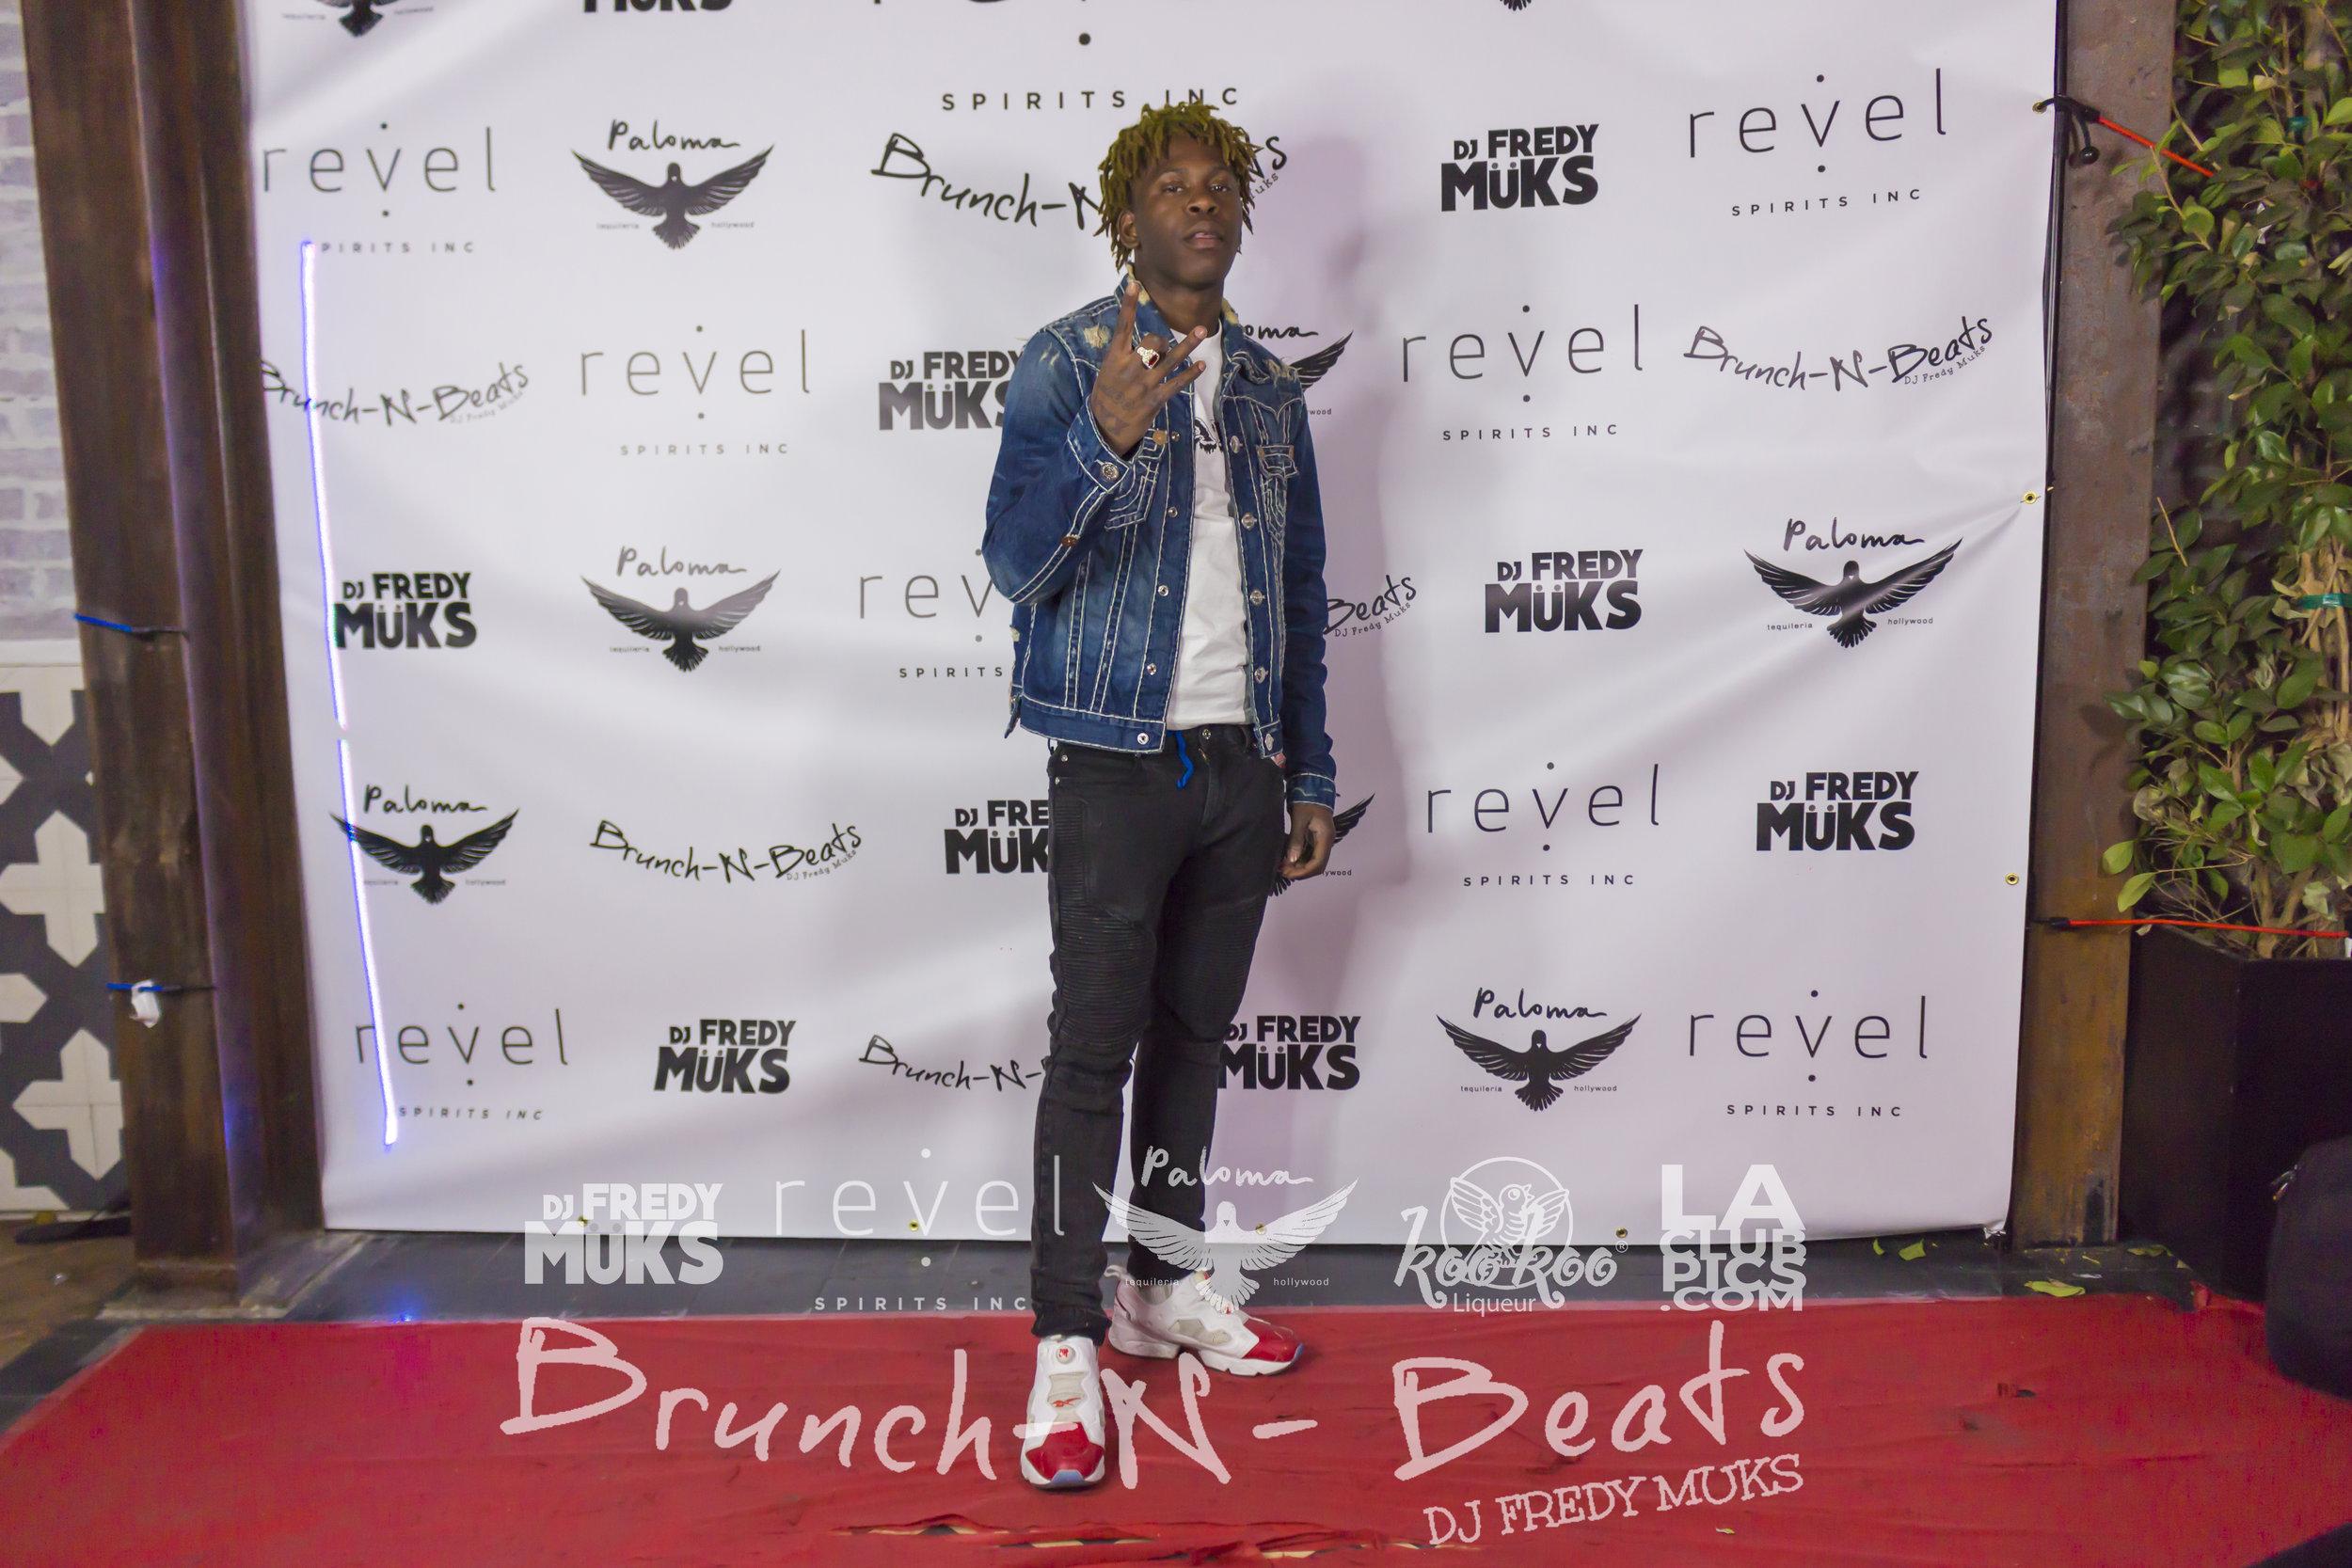 Brunch-N-Beats - Paloma Hollywood - 02-25-18_243.jpg